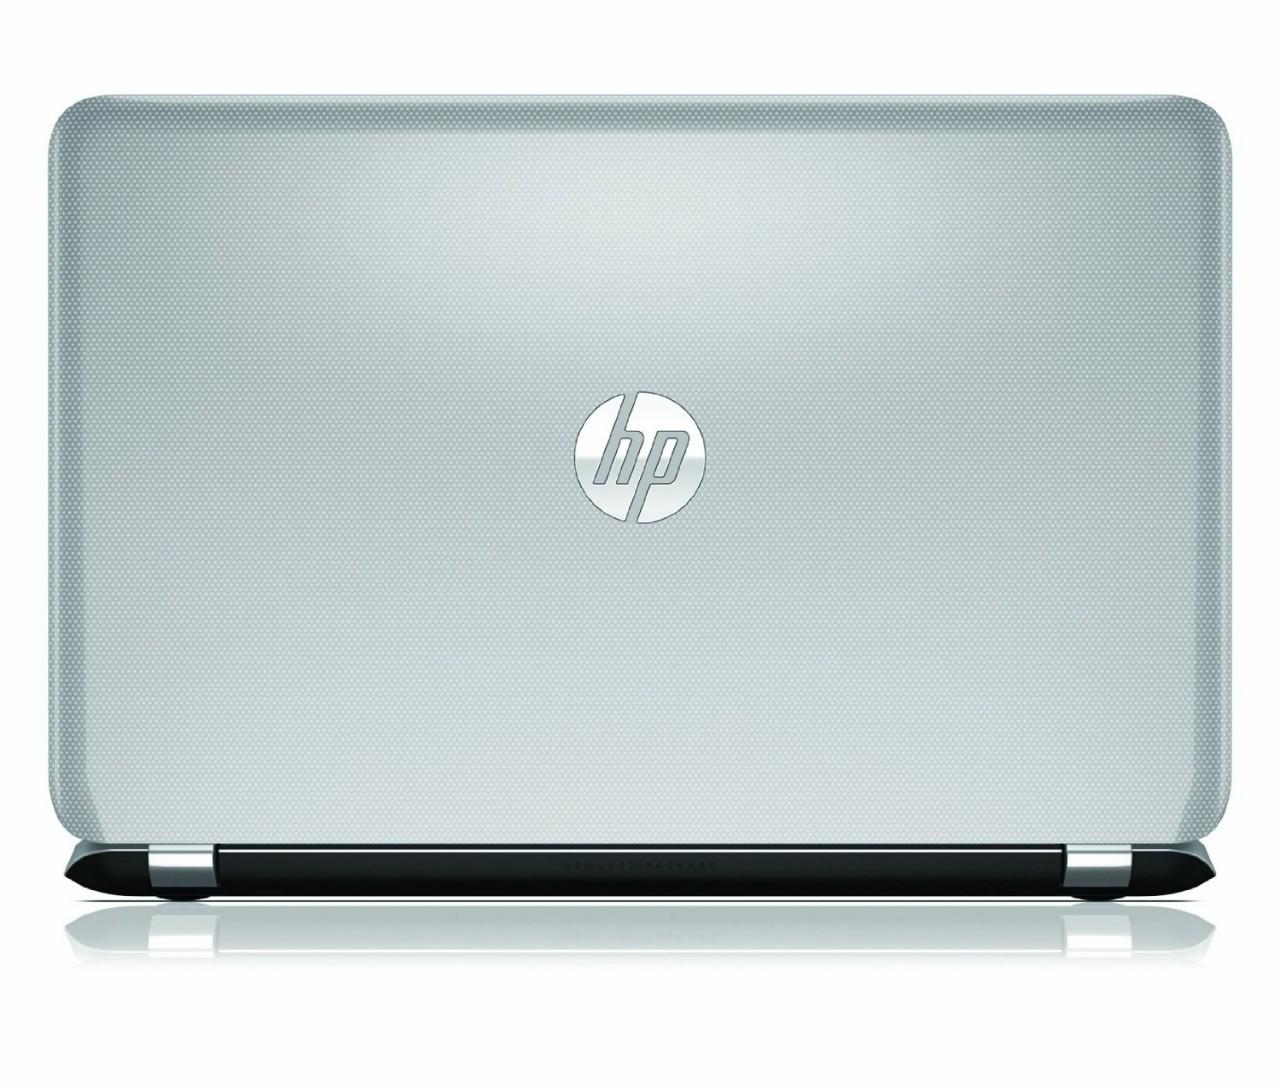 Notebook HP Pavilion TouchSmart 15n210dx Download